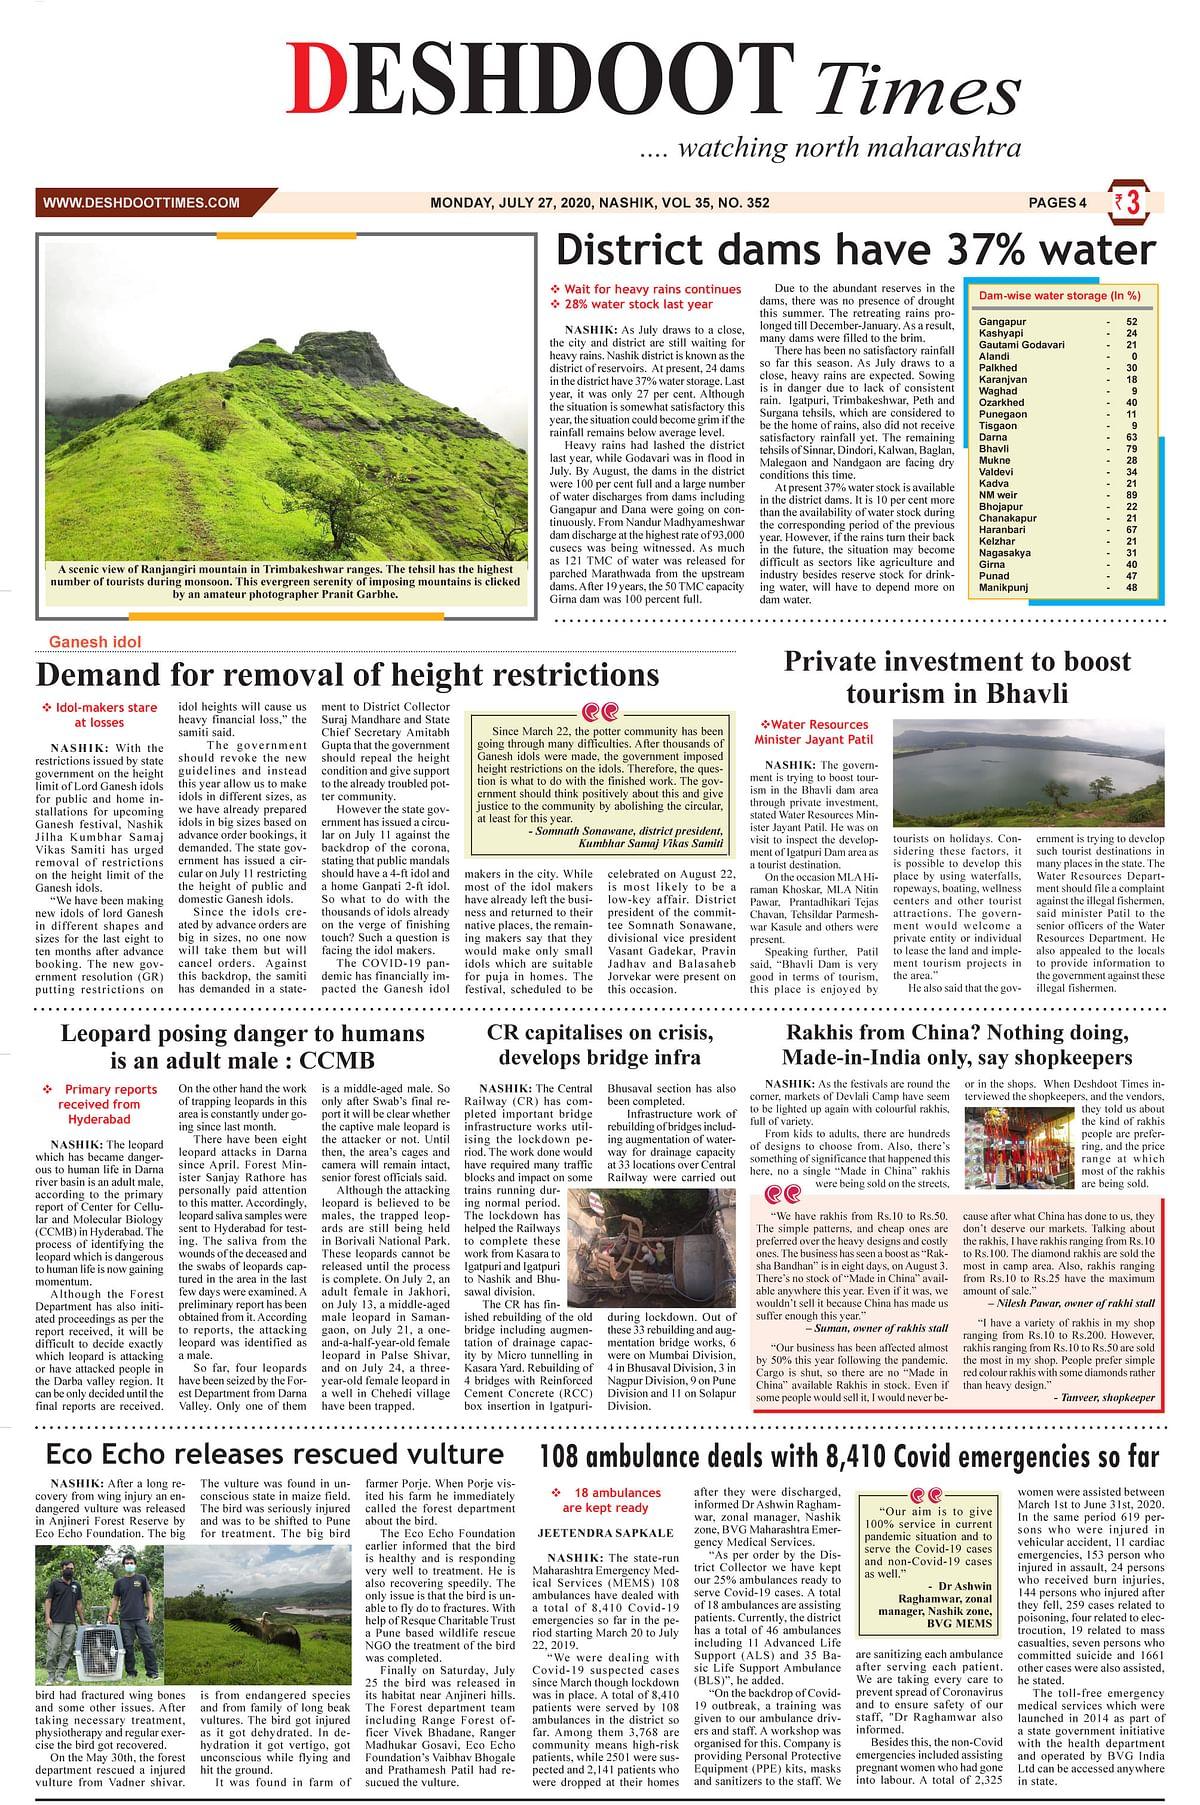 Deshdoot Times E Paper, 27 July 2020